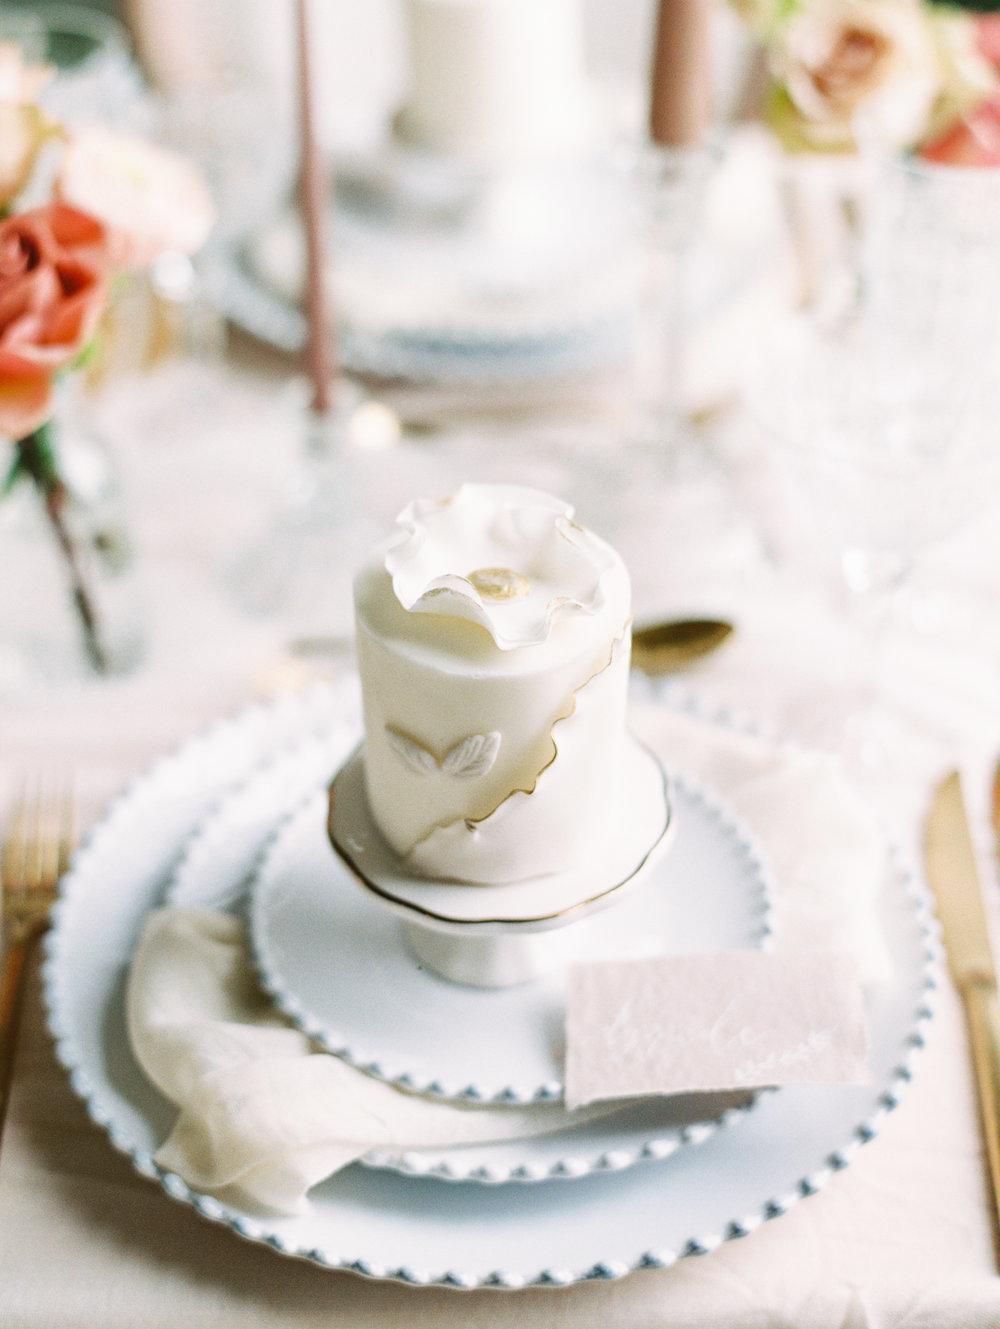 The Timeless Stylist-Elegant and Romantic Wedding Styling-Mini Cake Place Setting